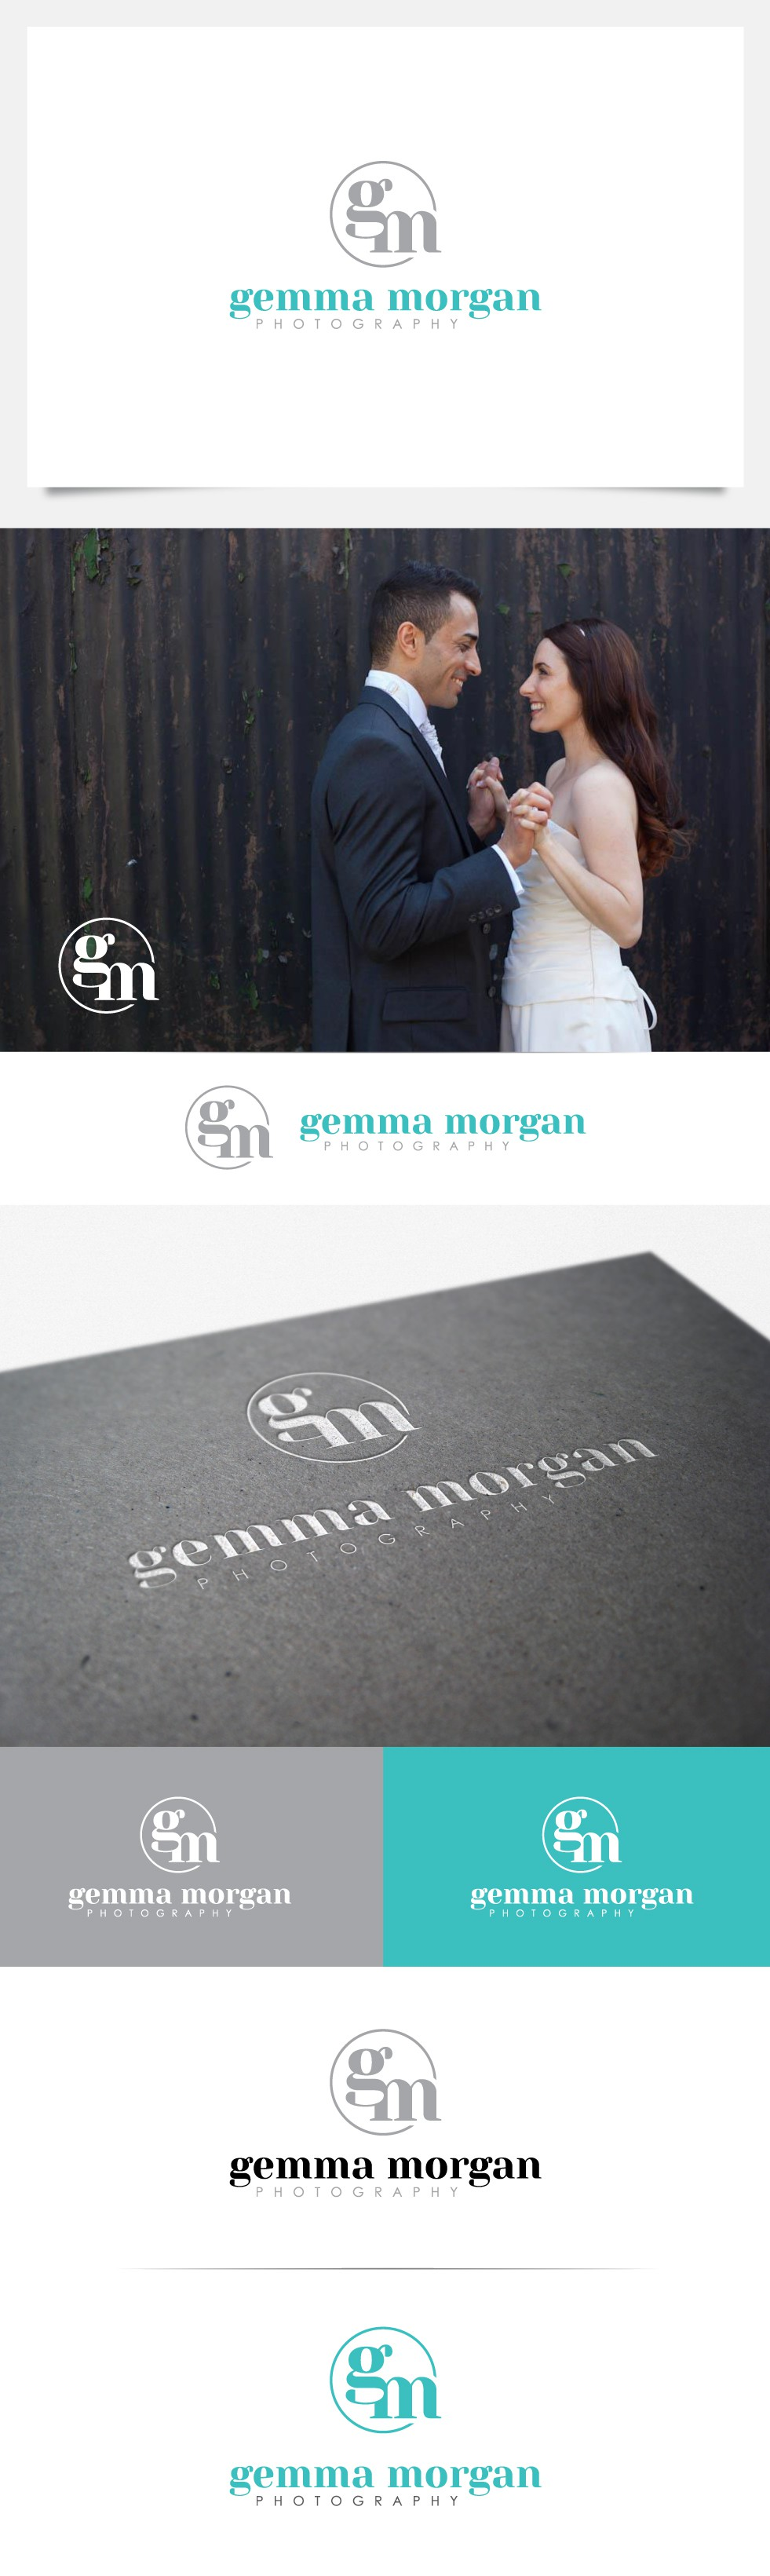 Gemma Morgan Photography needs a new logo